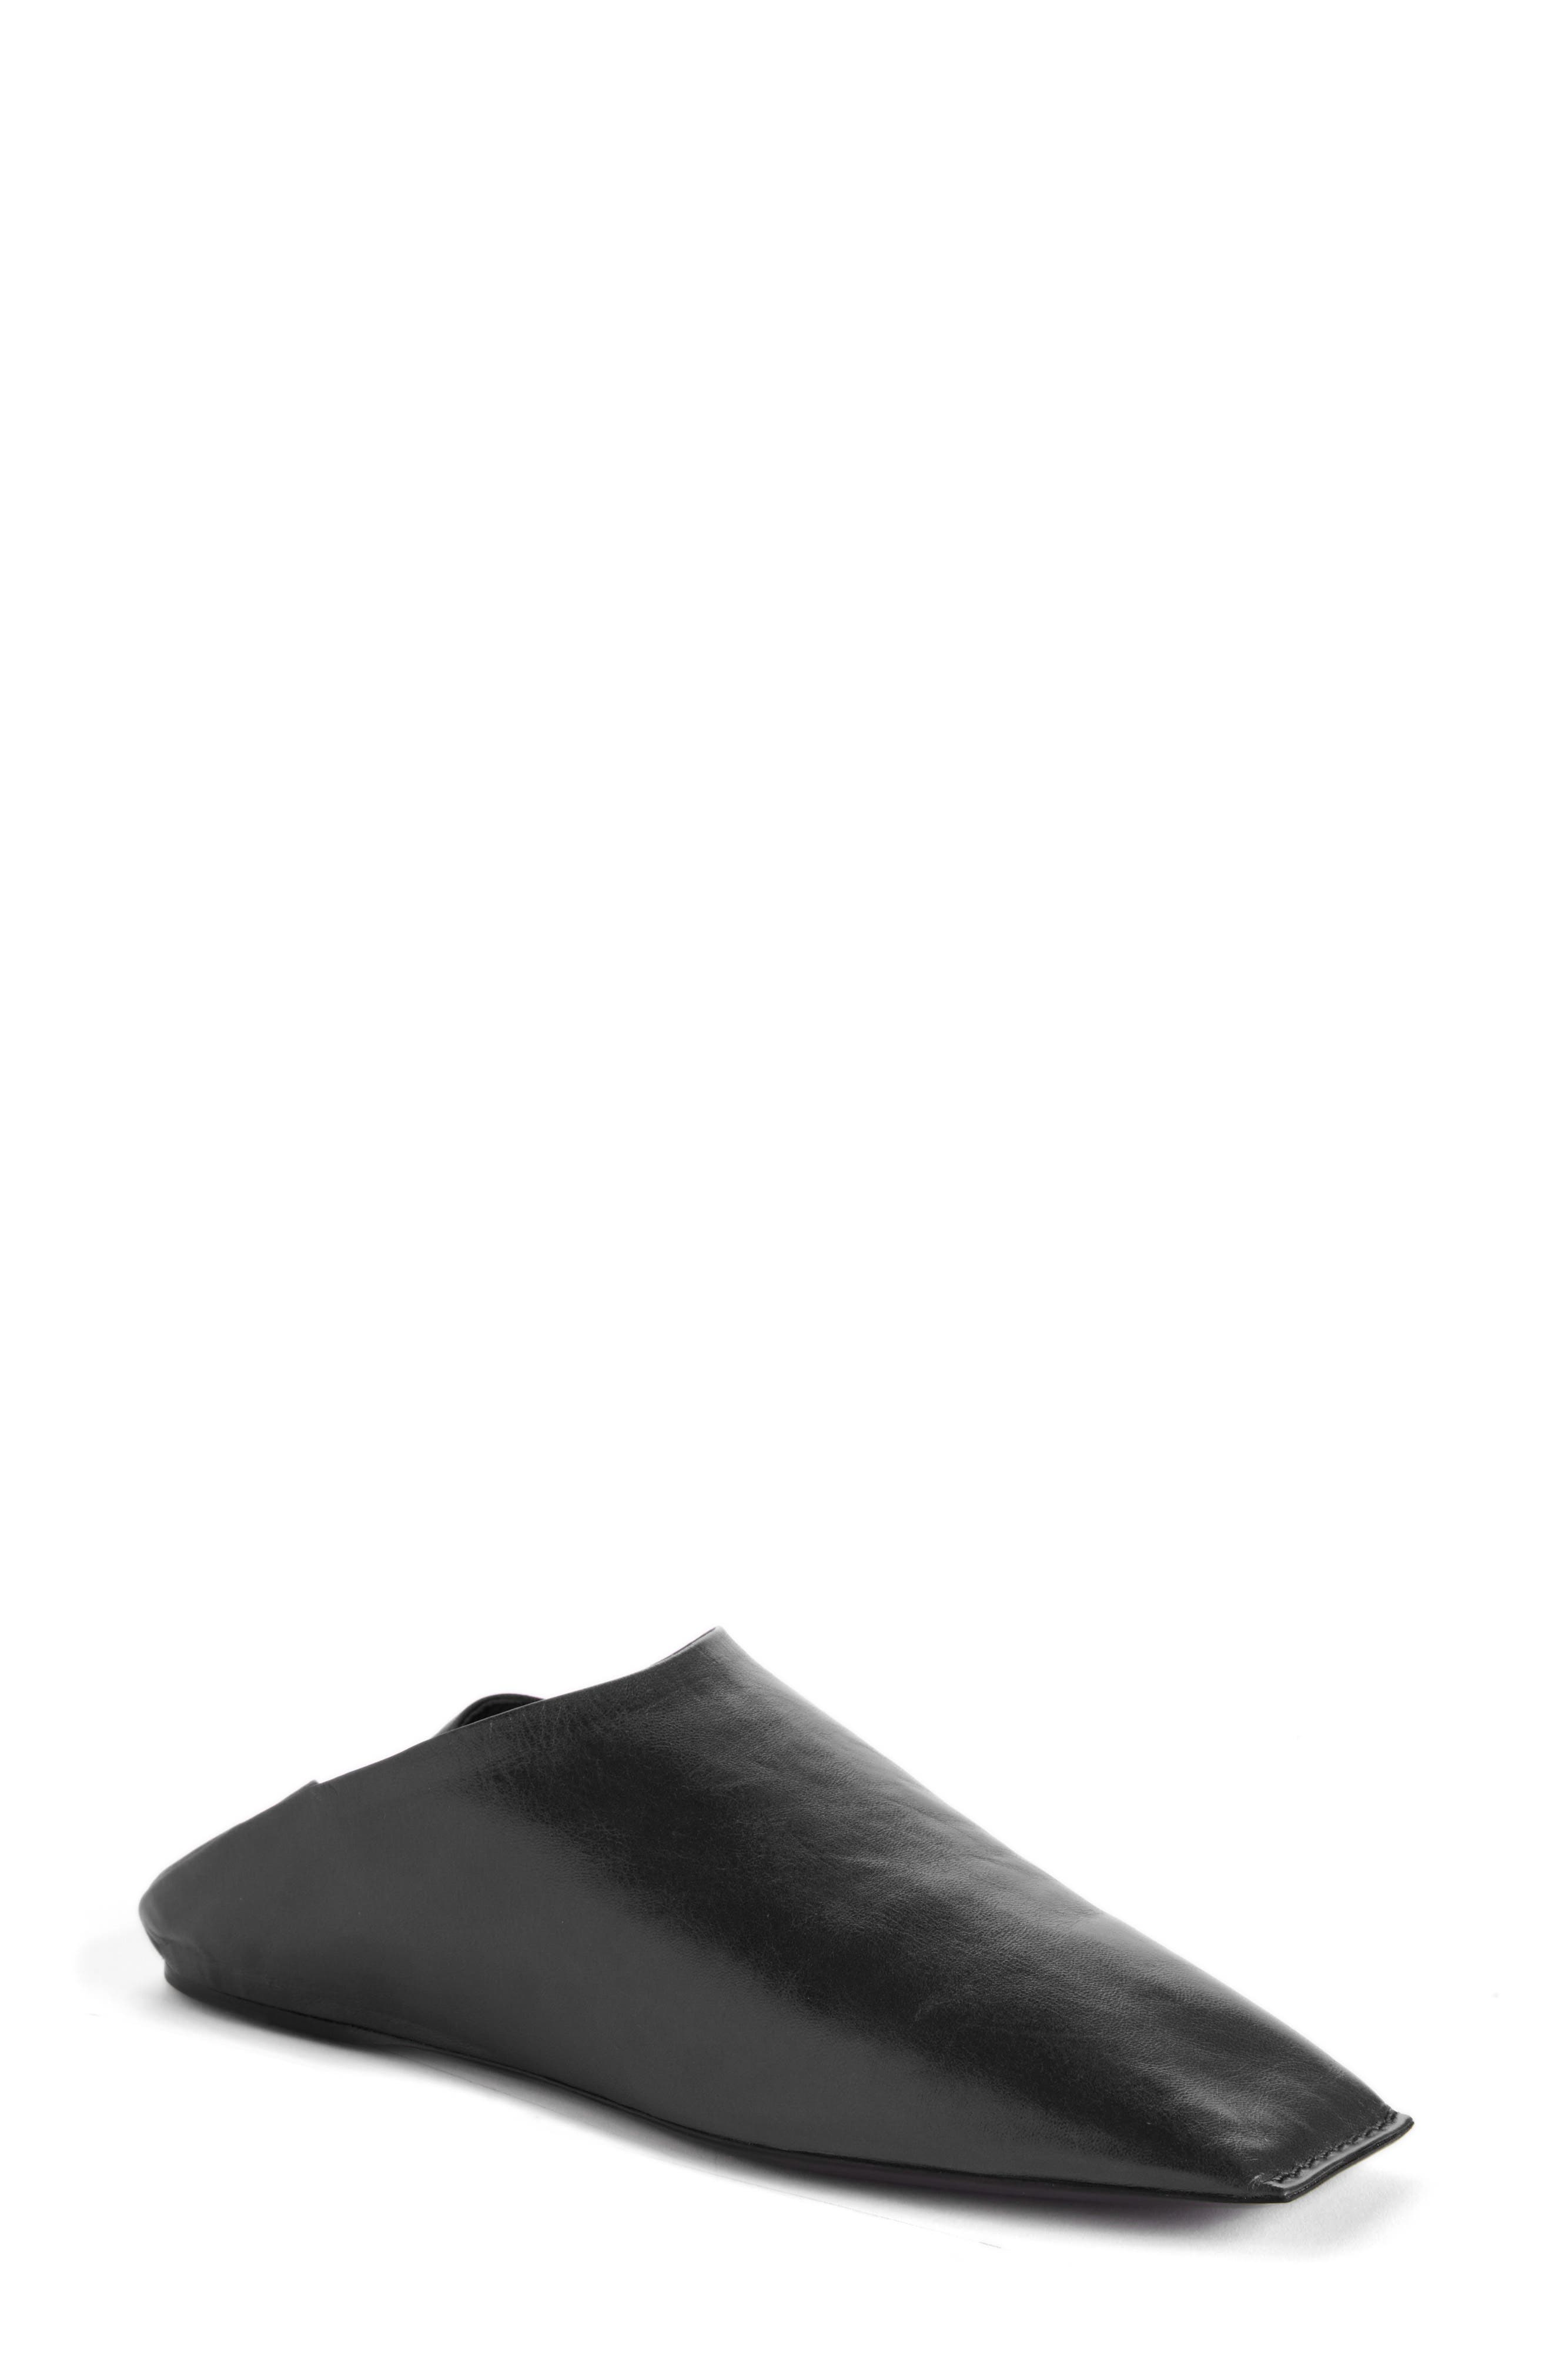 Alternate Image 1 Selected - Balenciaga Square Toe Mule (Women)